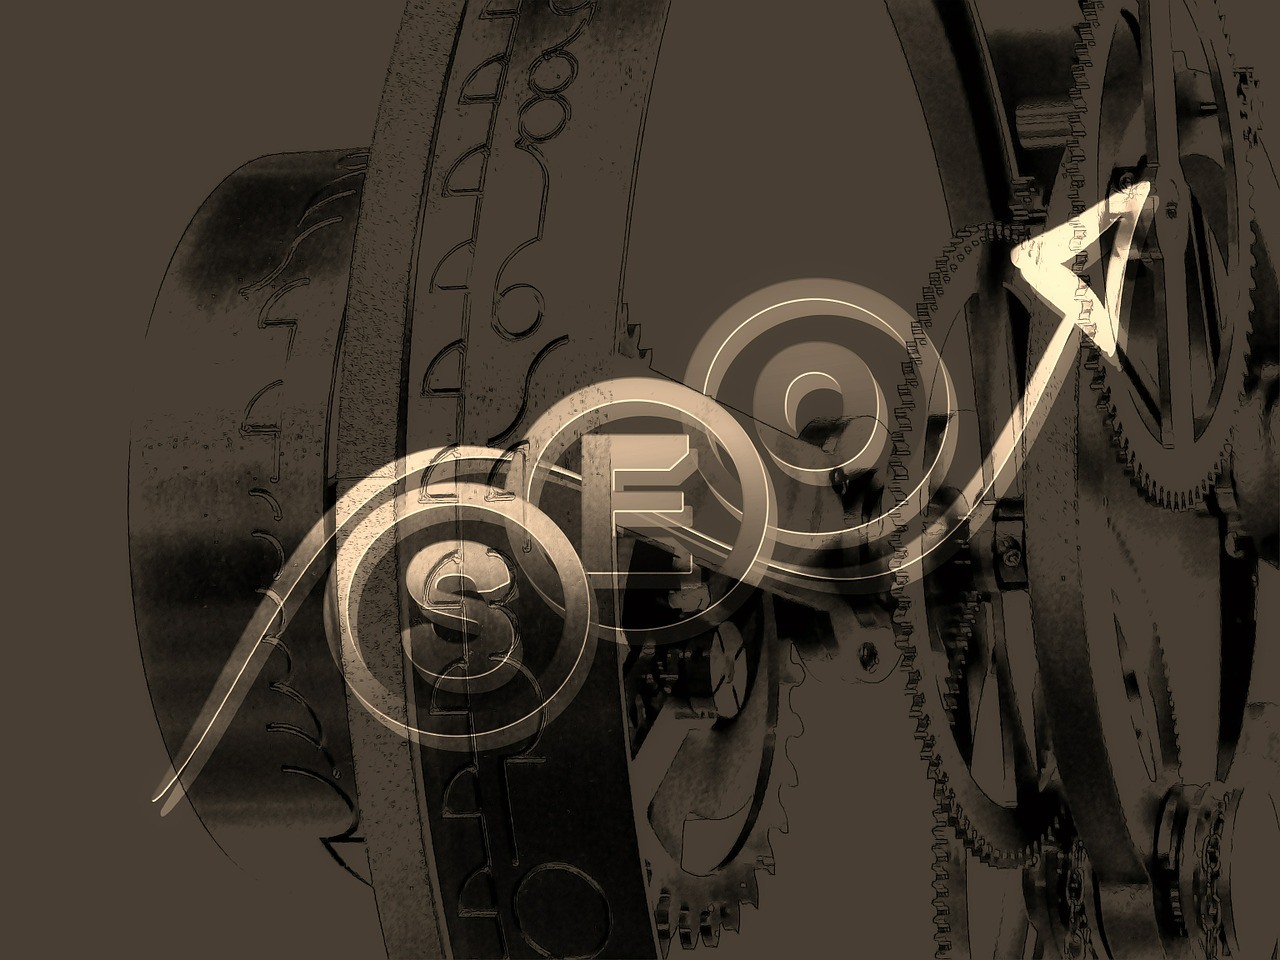 SEO for WordPress WordPress SEO effective SEO